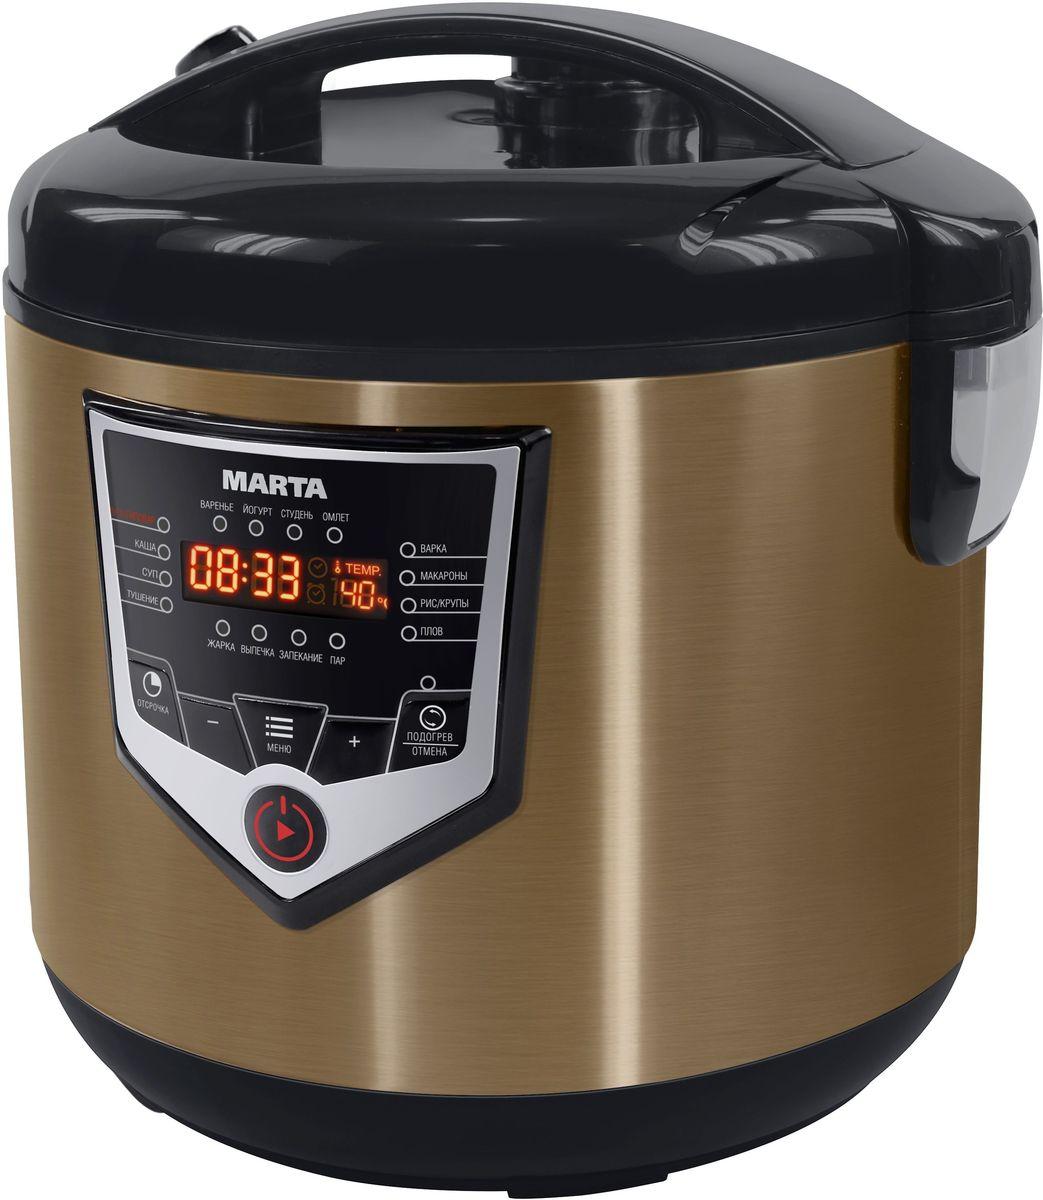 Marta MT-4301 Greblon C3+, Black мультиварка